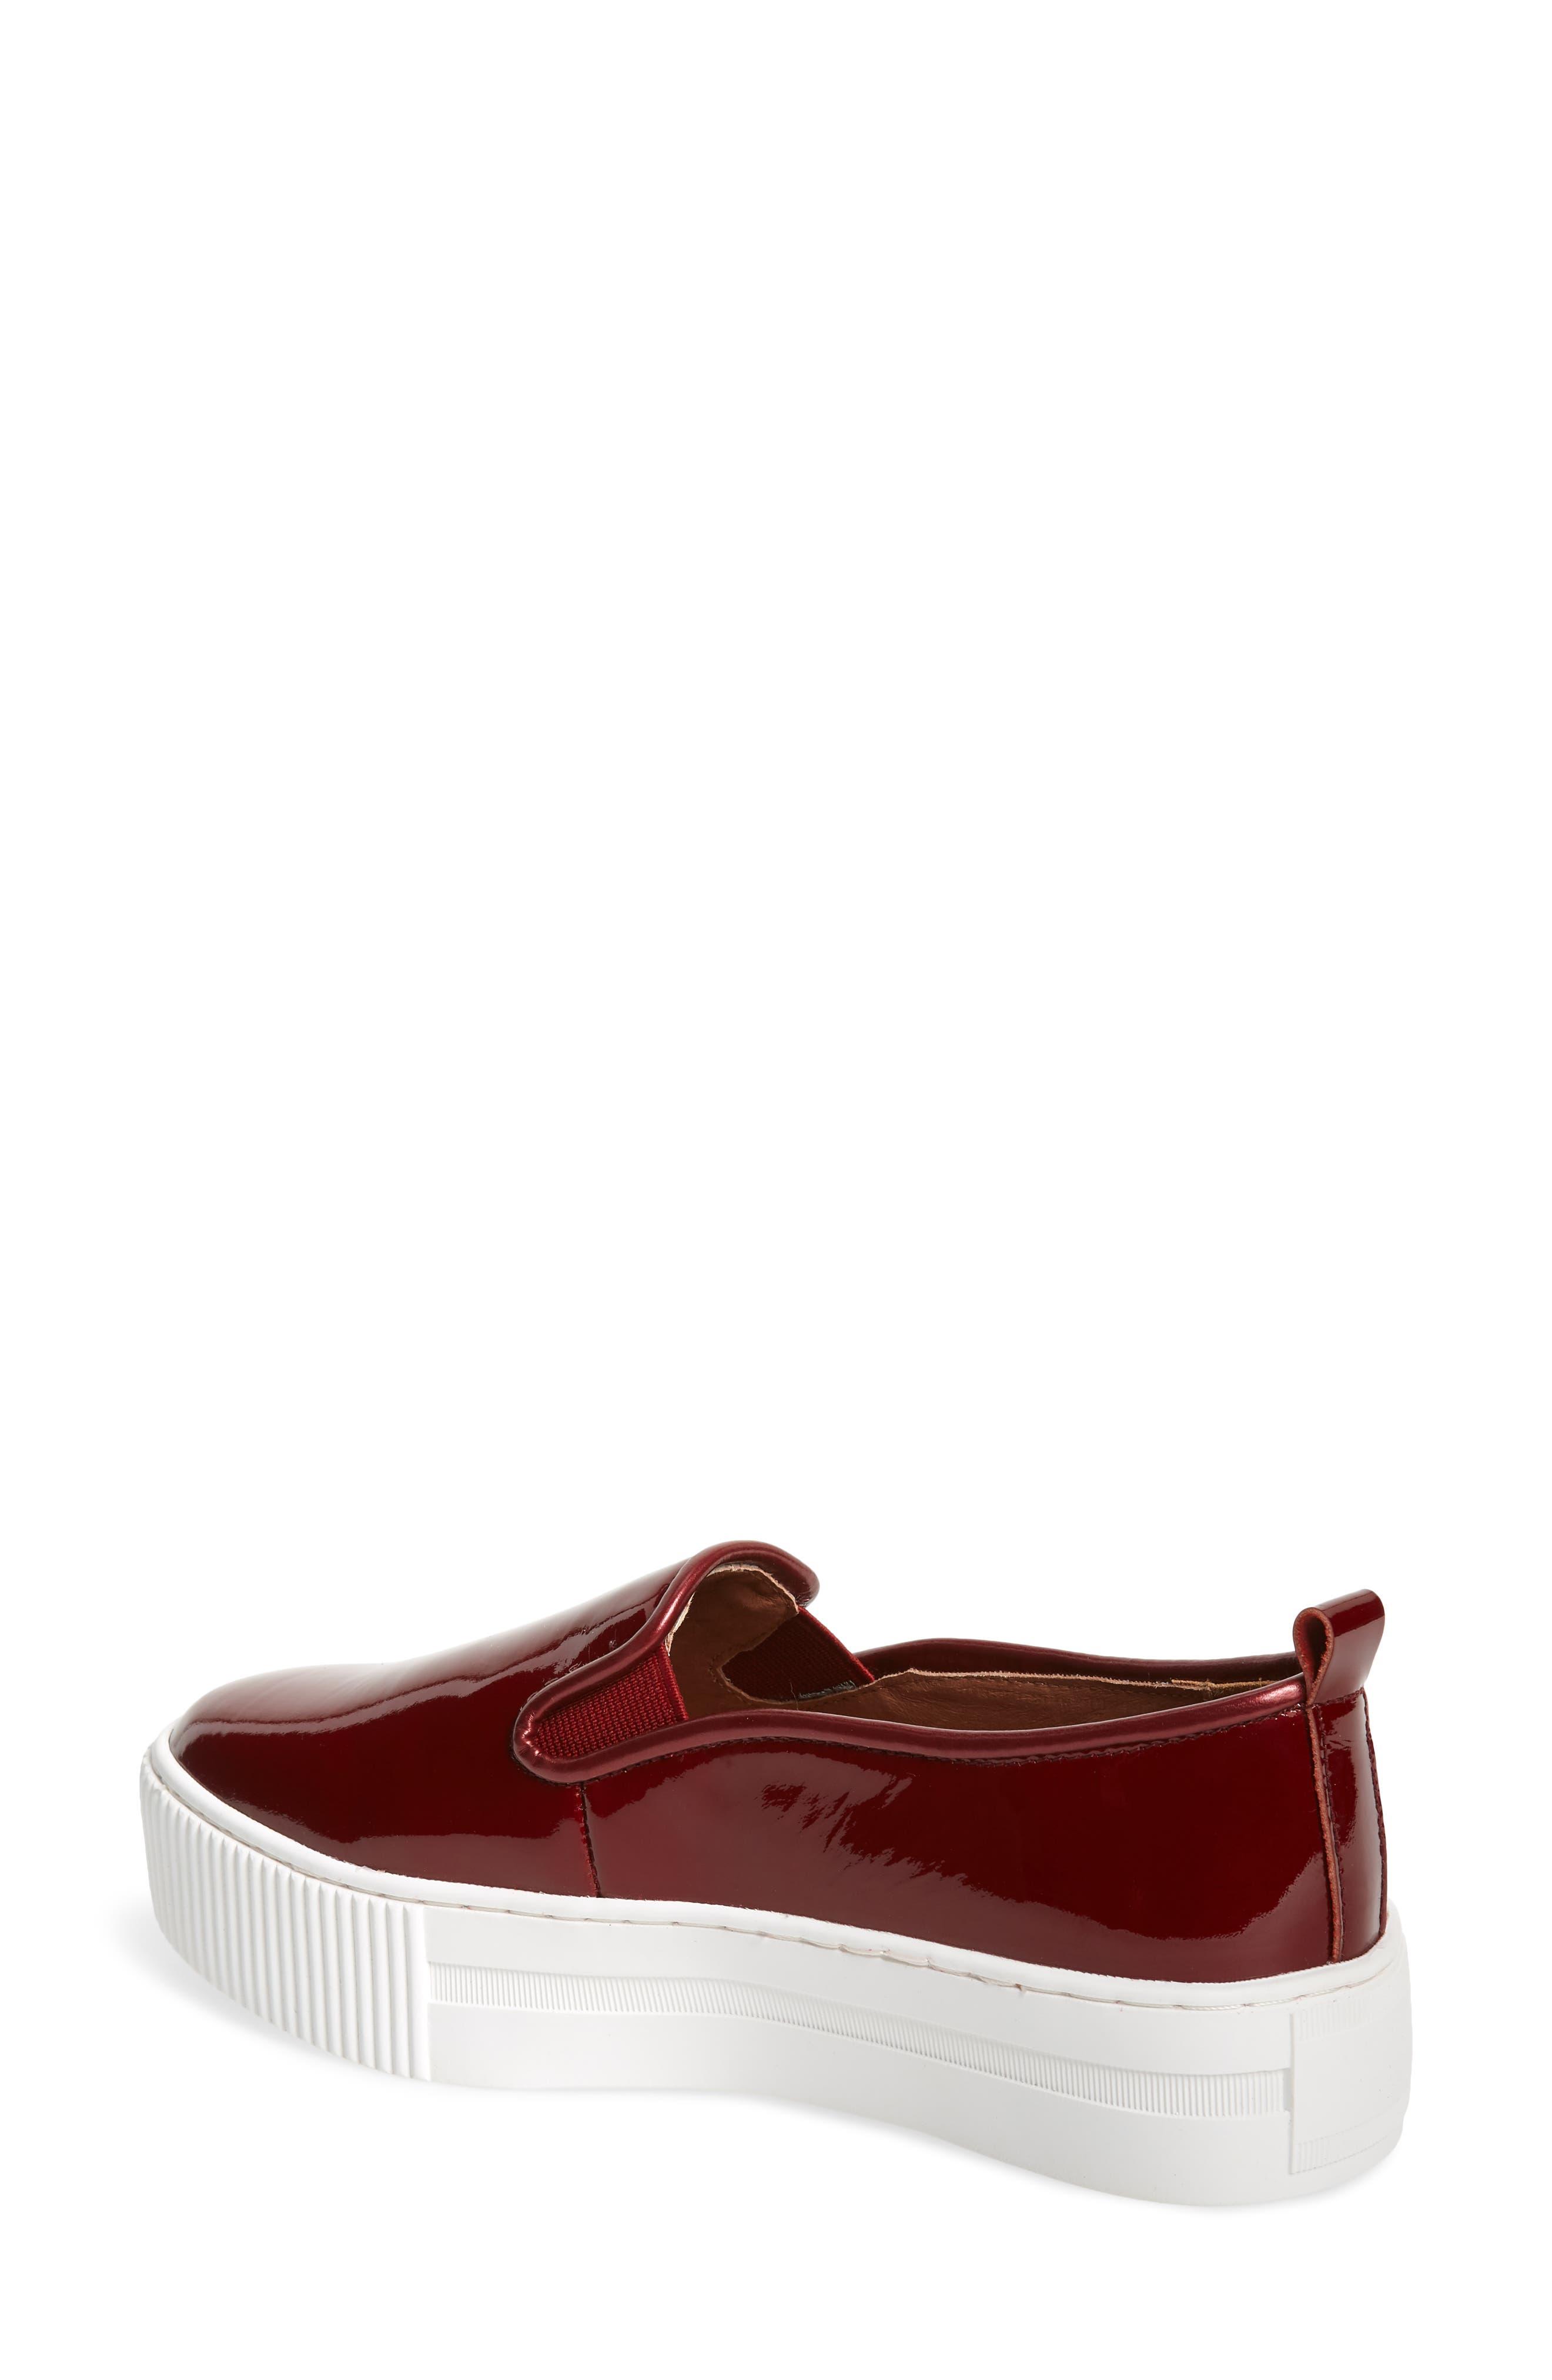 Baylee Platform Slip-On Sneaker,                             Alternate thumbnail 2, color,                             930